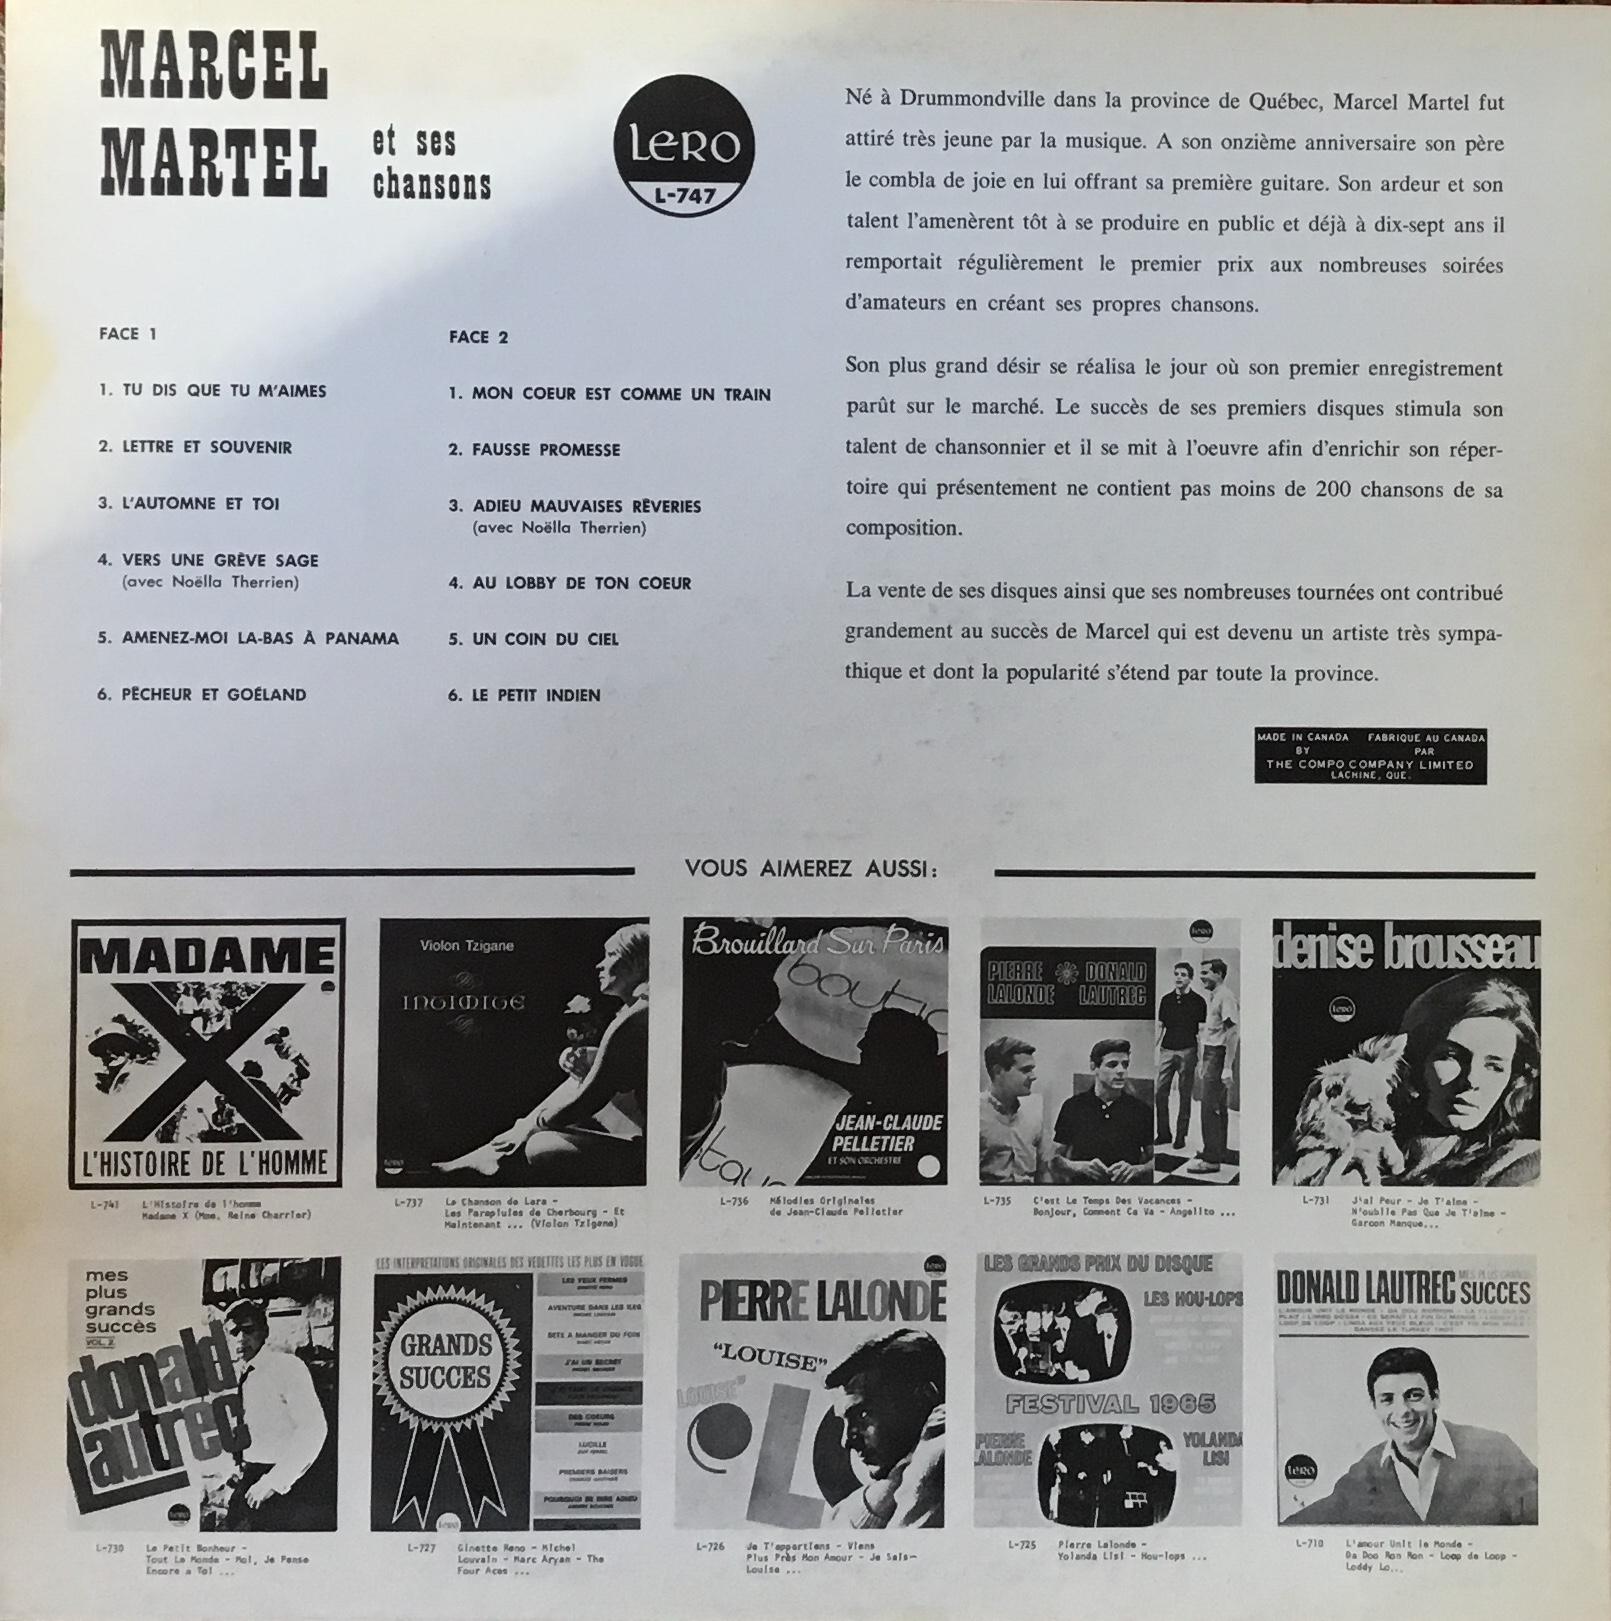 MarcelMartelEtSesChansonsBack